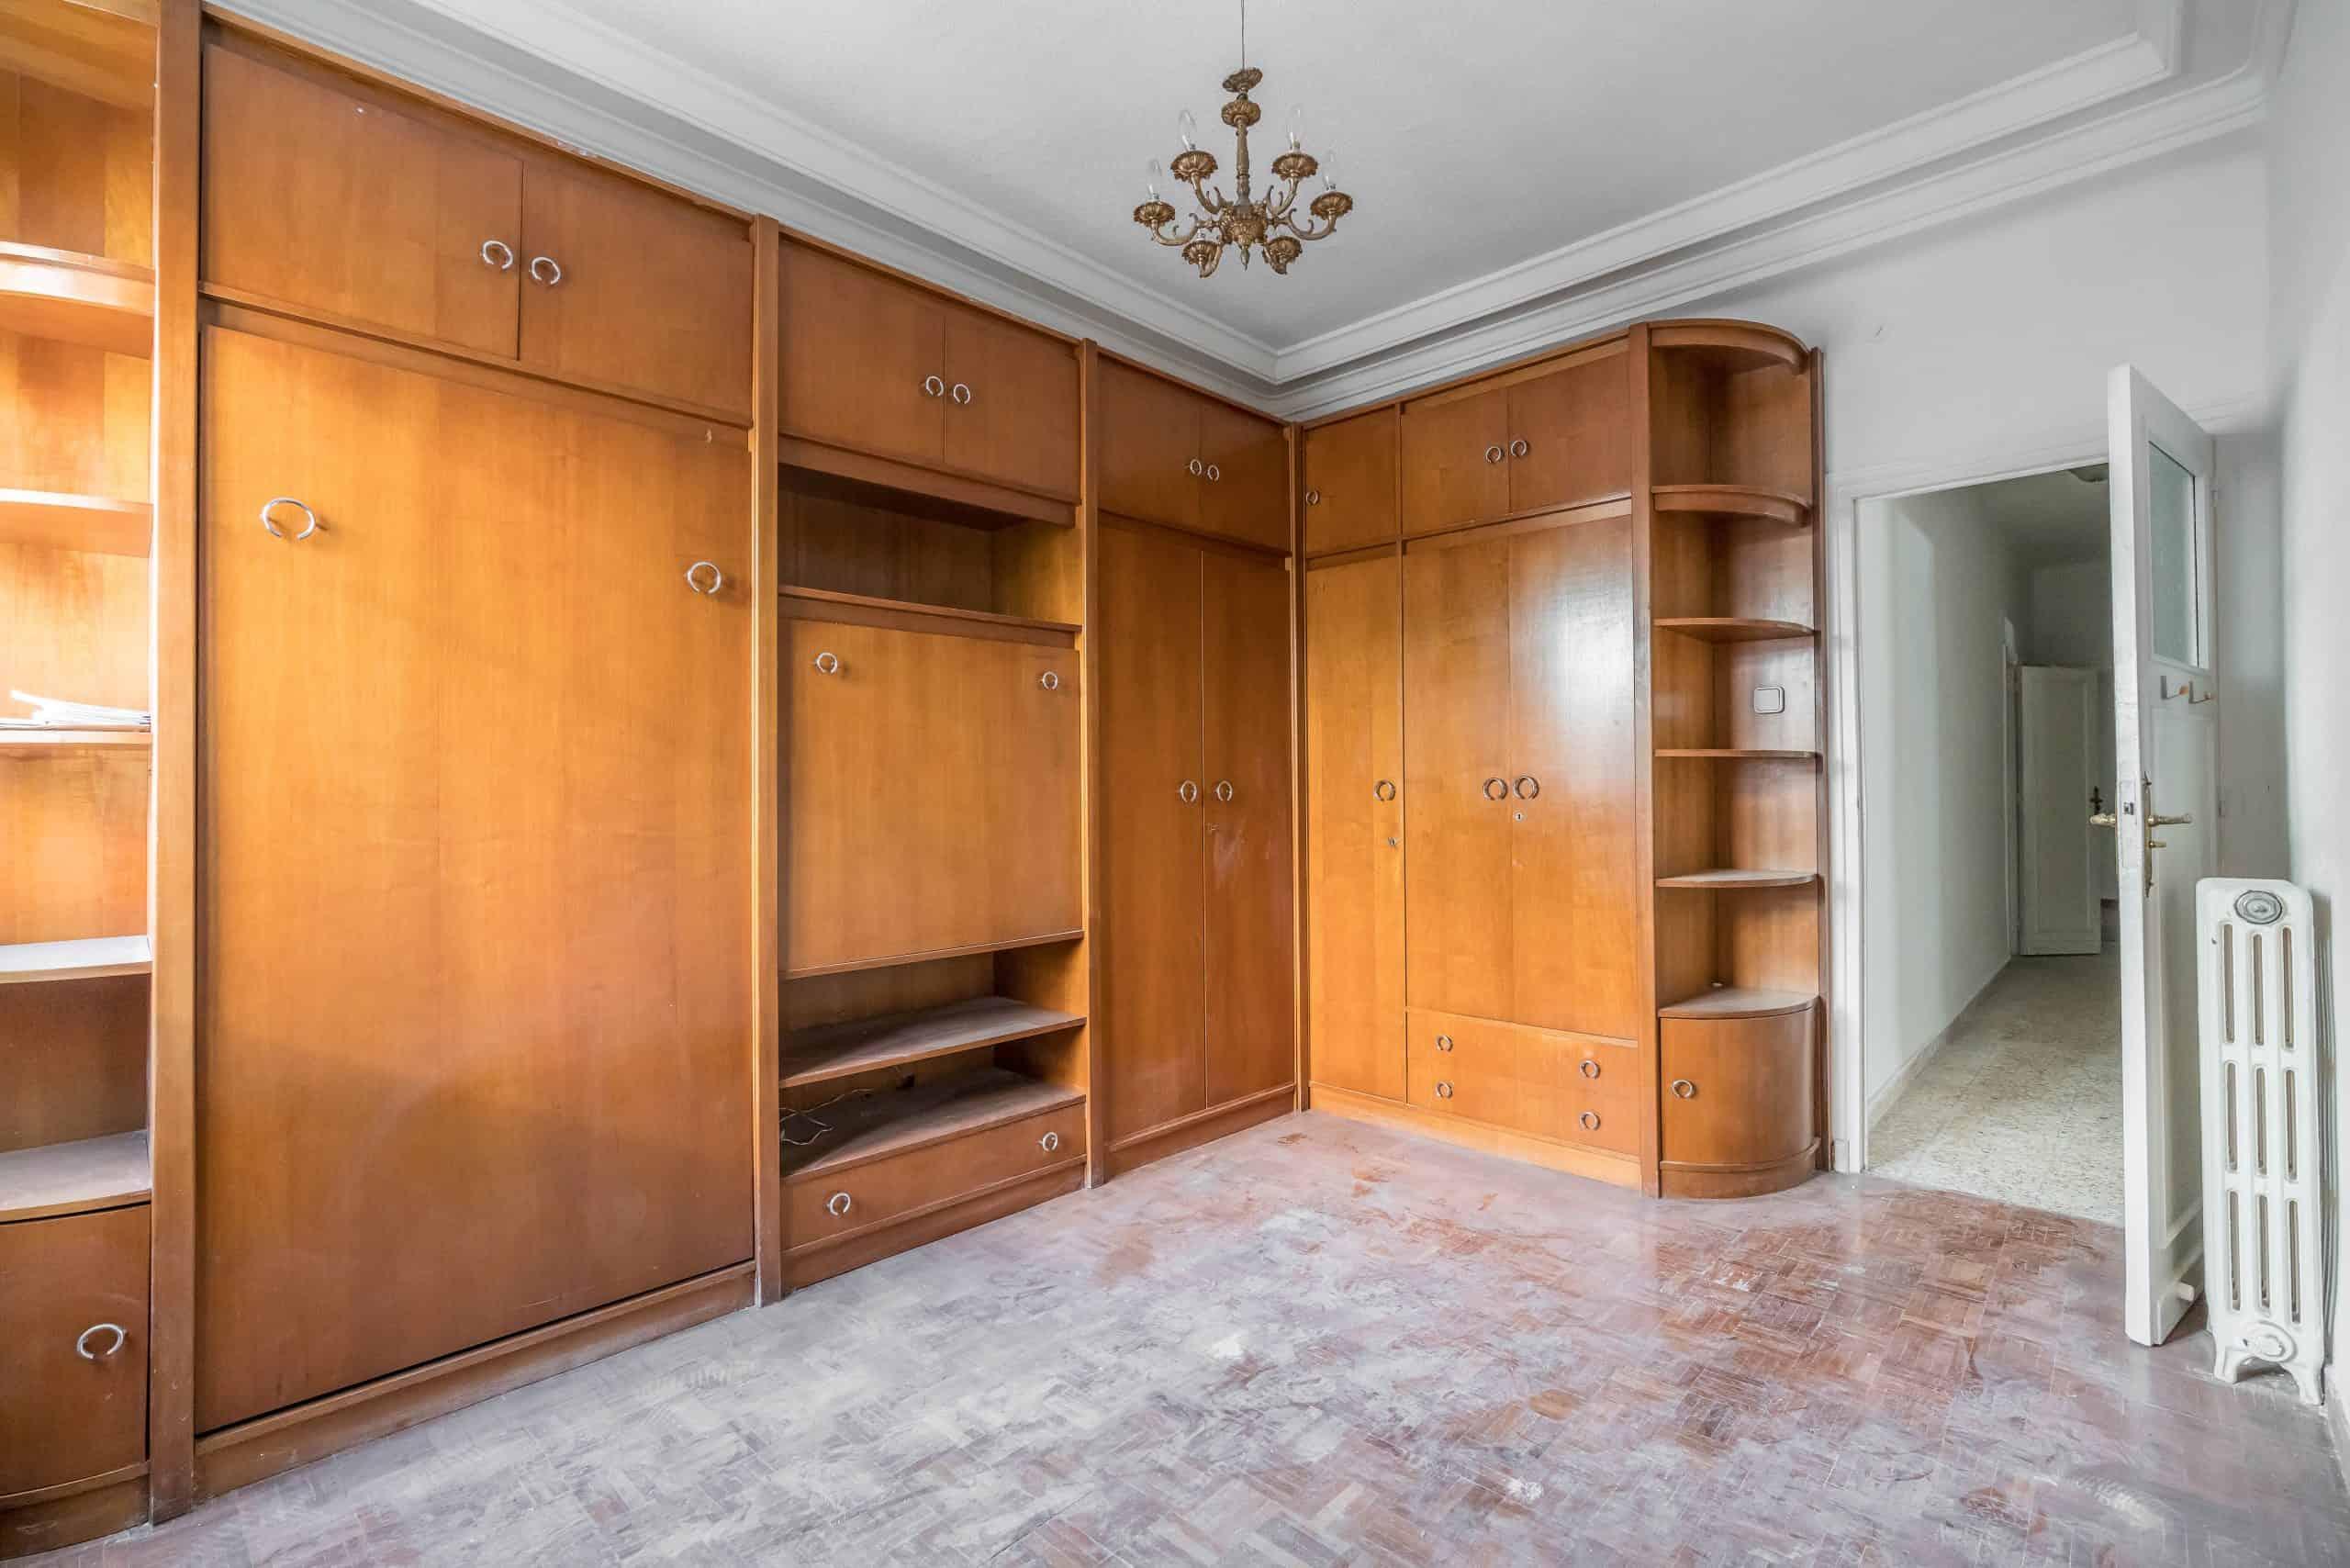 Agencia Inmobiliaria de Madrid-FUTUROCASA-Zona ARGANZUELA-EMBAJADORES-LEGAZPI -calle ALEJANDRO FERRANT -DORMITORIO2-1